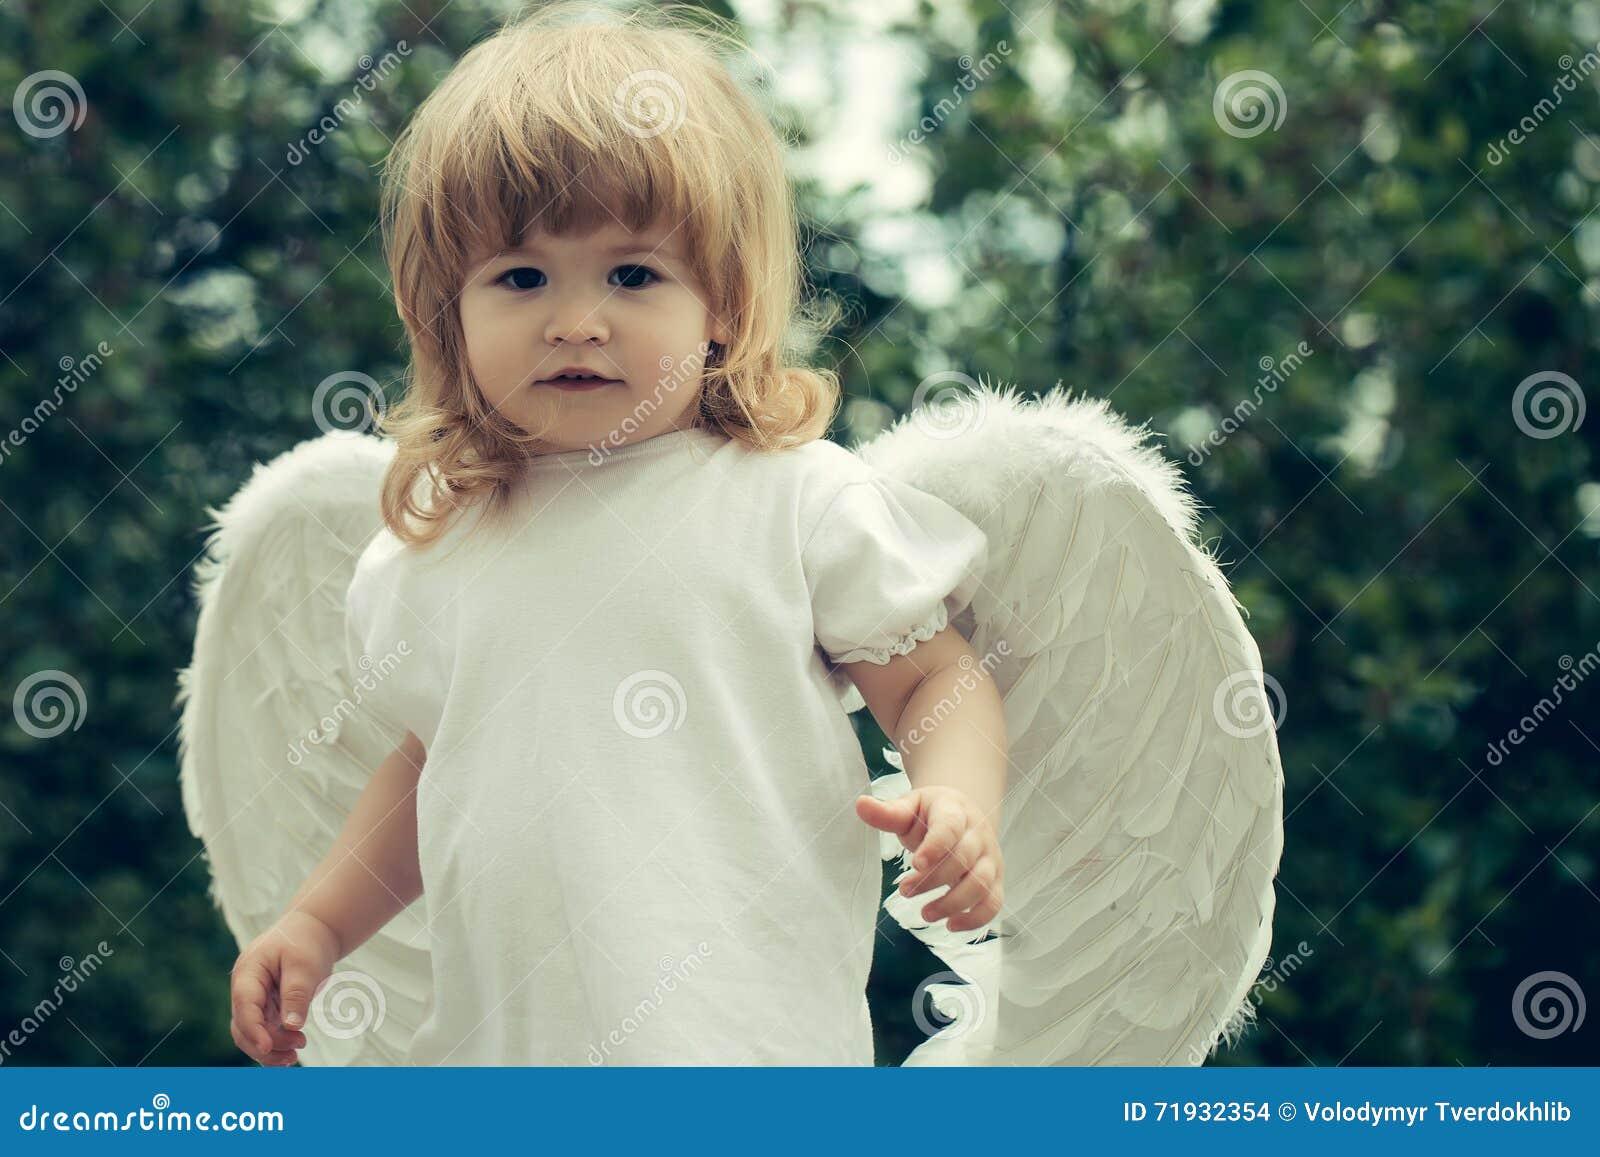 Мальчик одетый как ангел